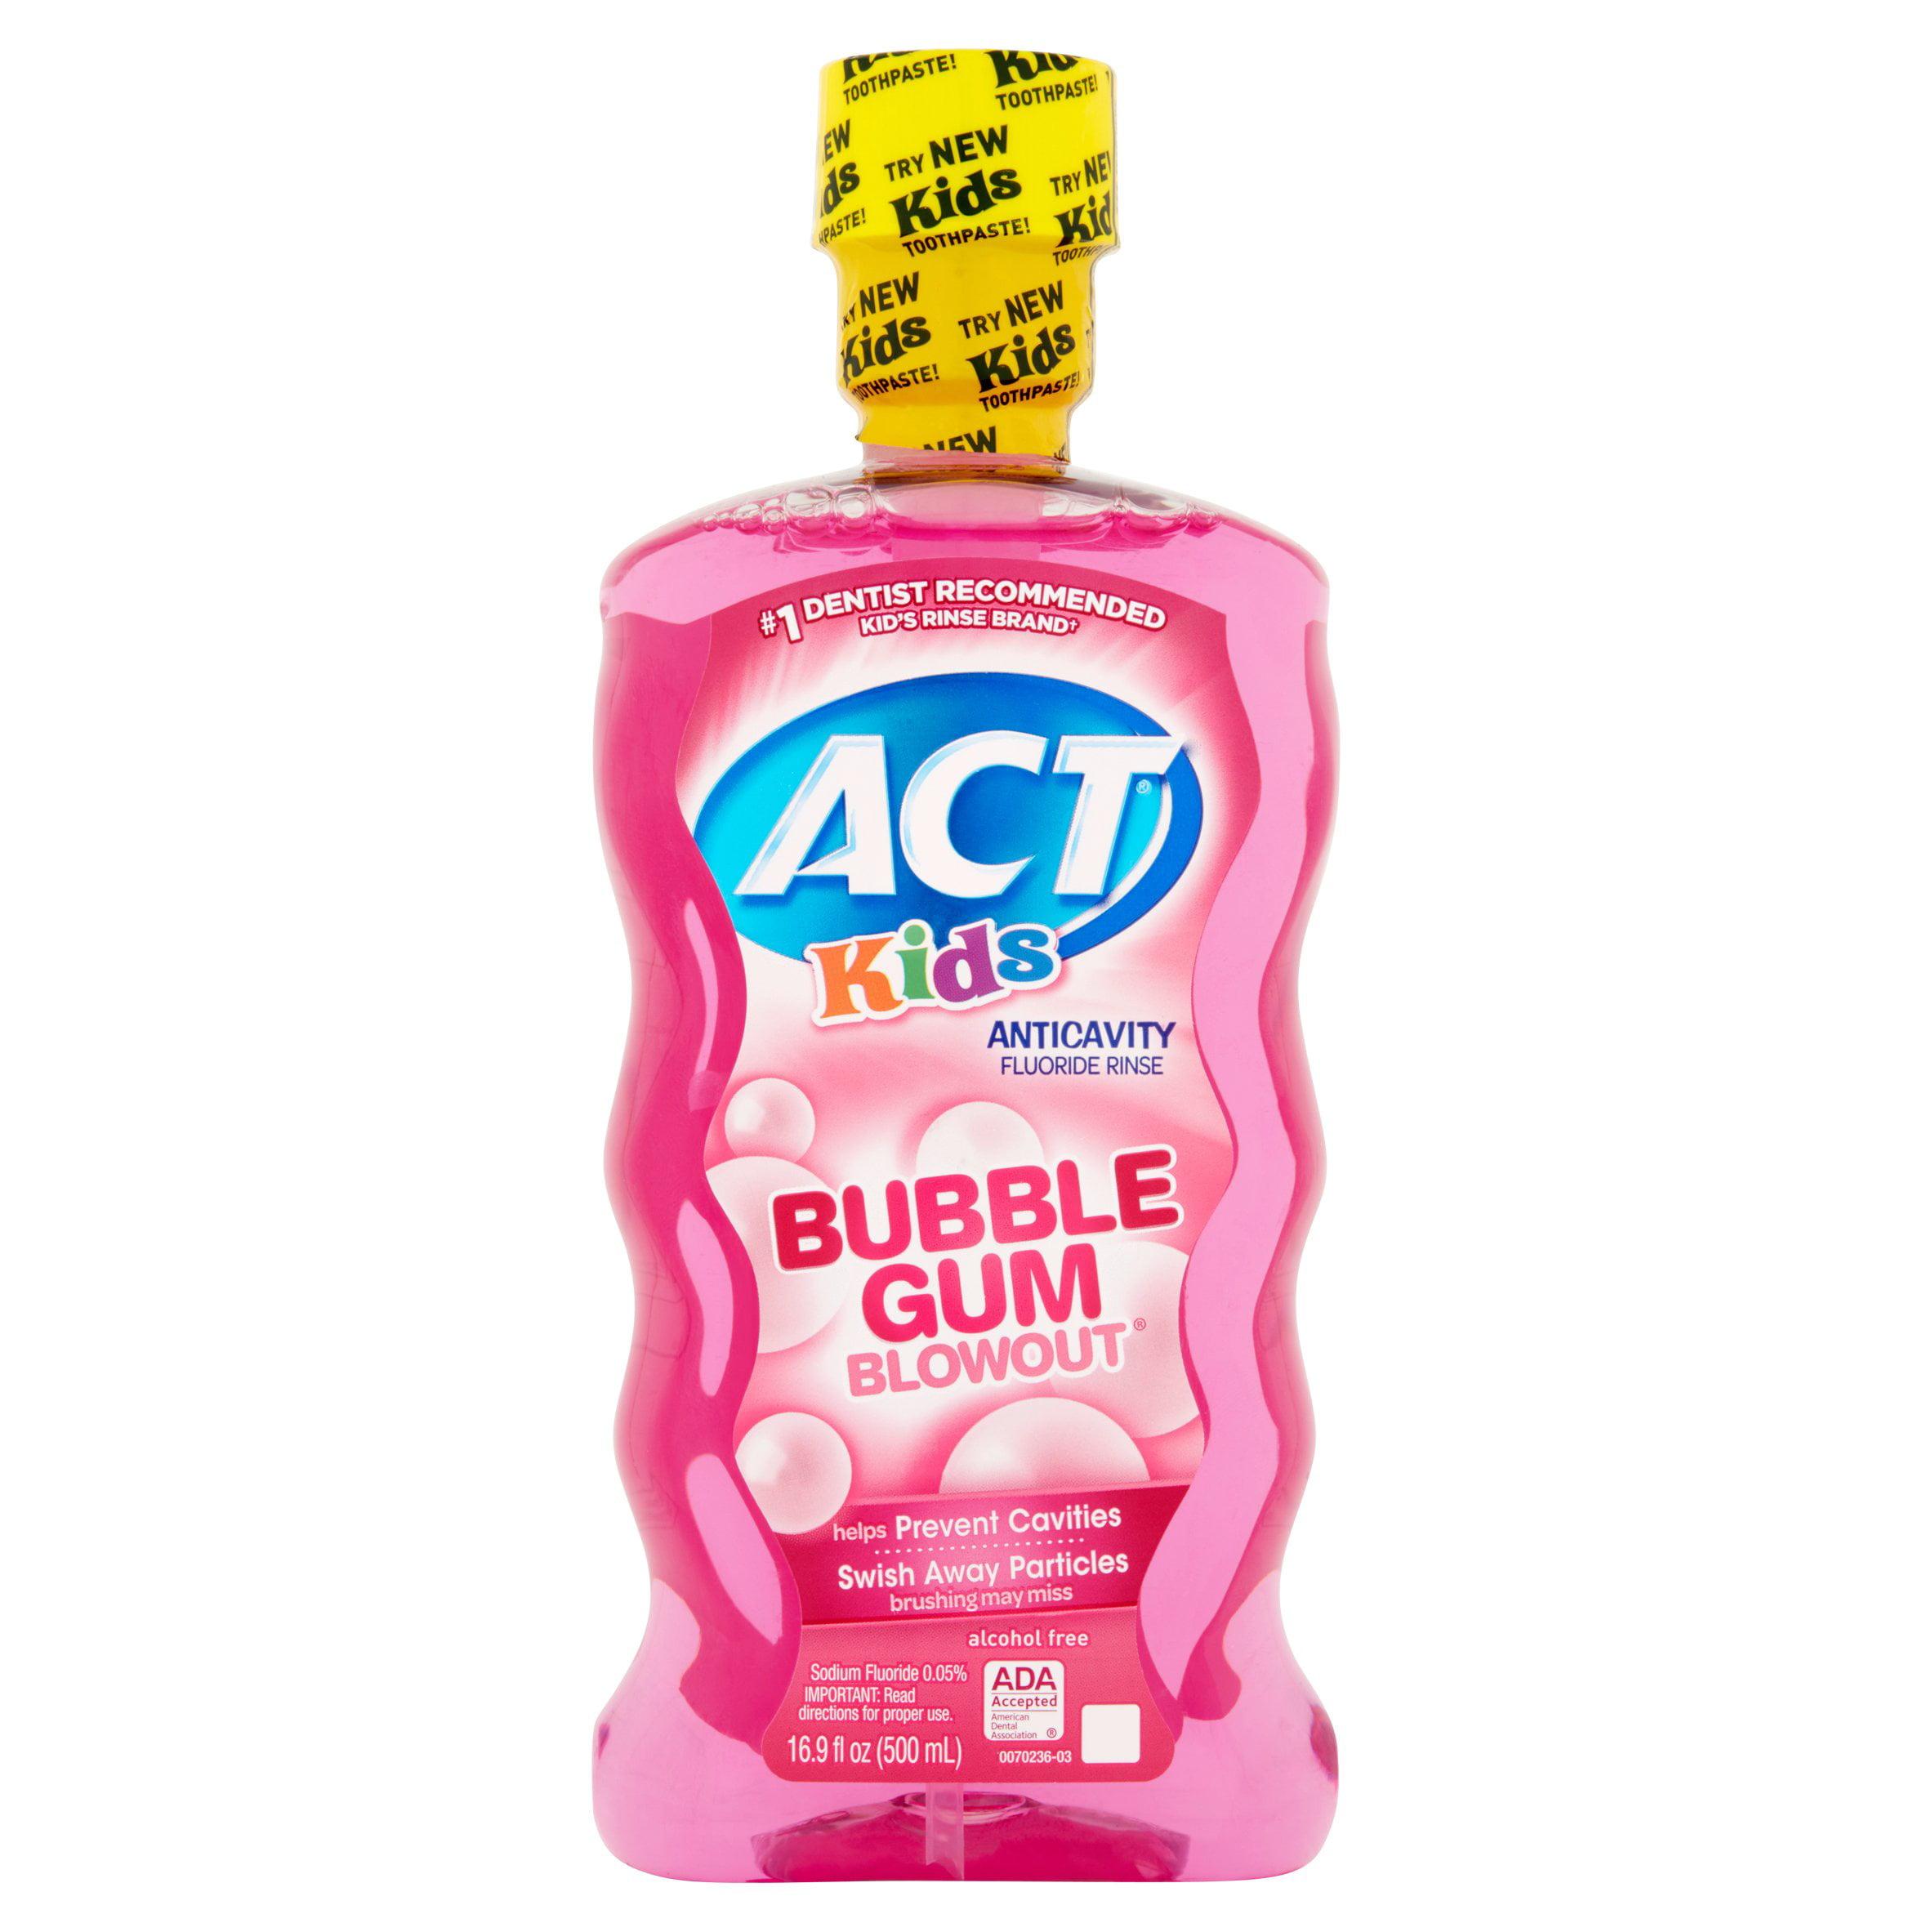 ACT Kids Bubble Gum Blowout Anticavity Fluoride Rinse, 16.9oz